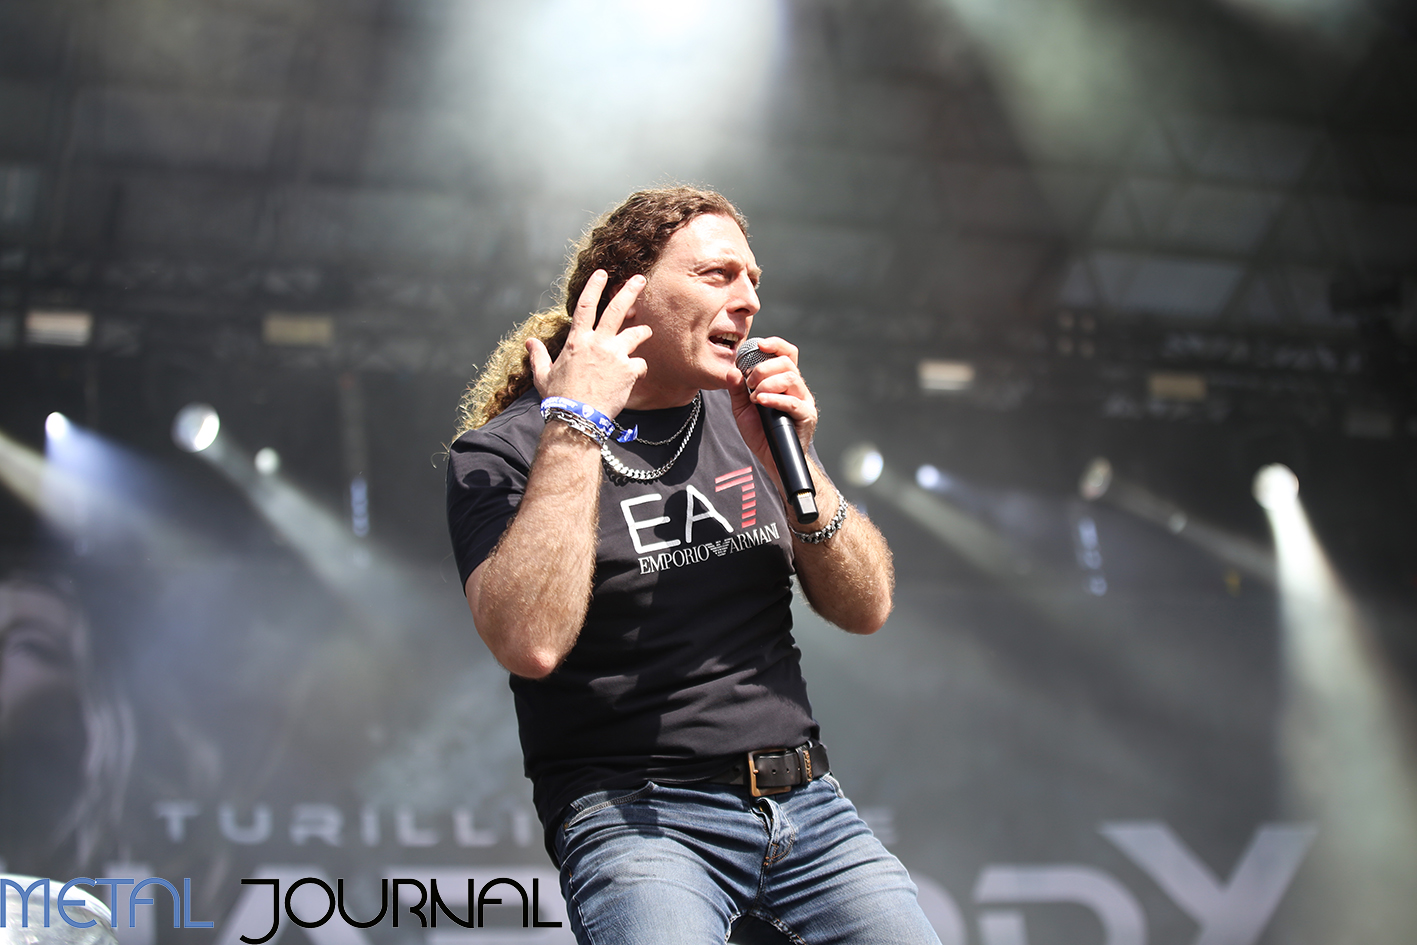 turilli lione rhapsody - metal journal rock fest barcelona 2019 pic 4